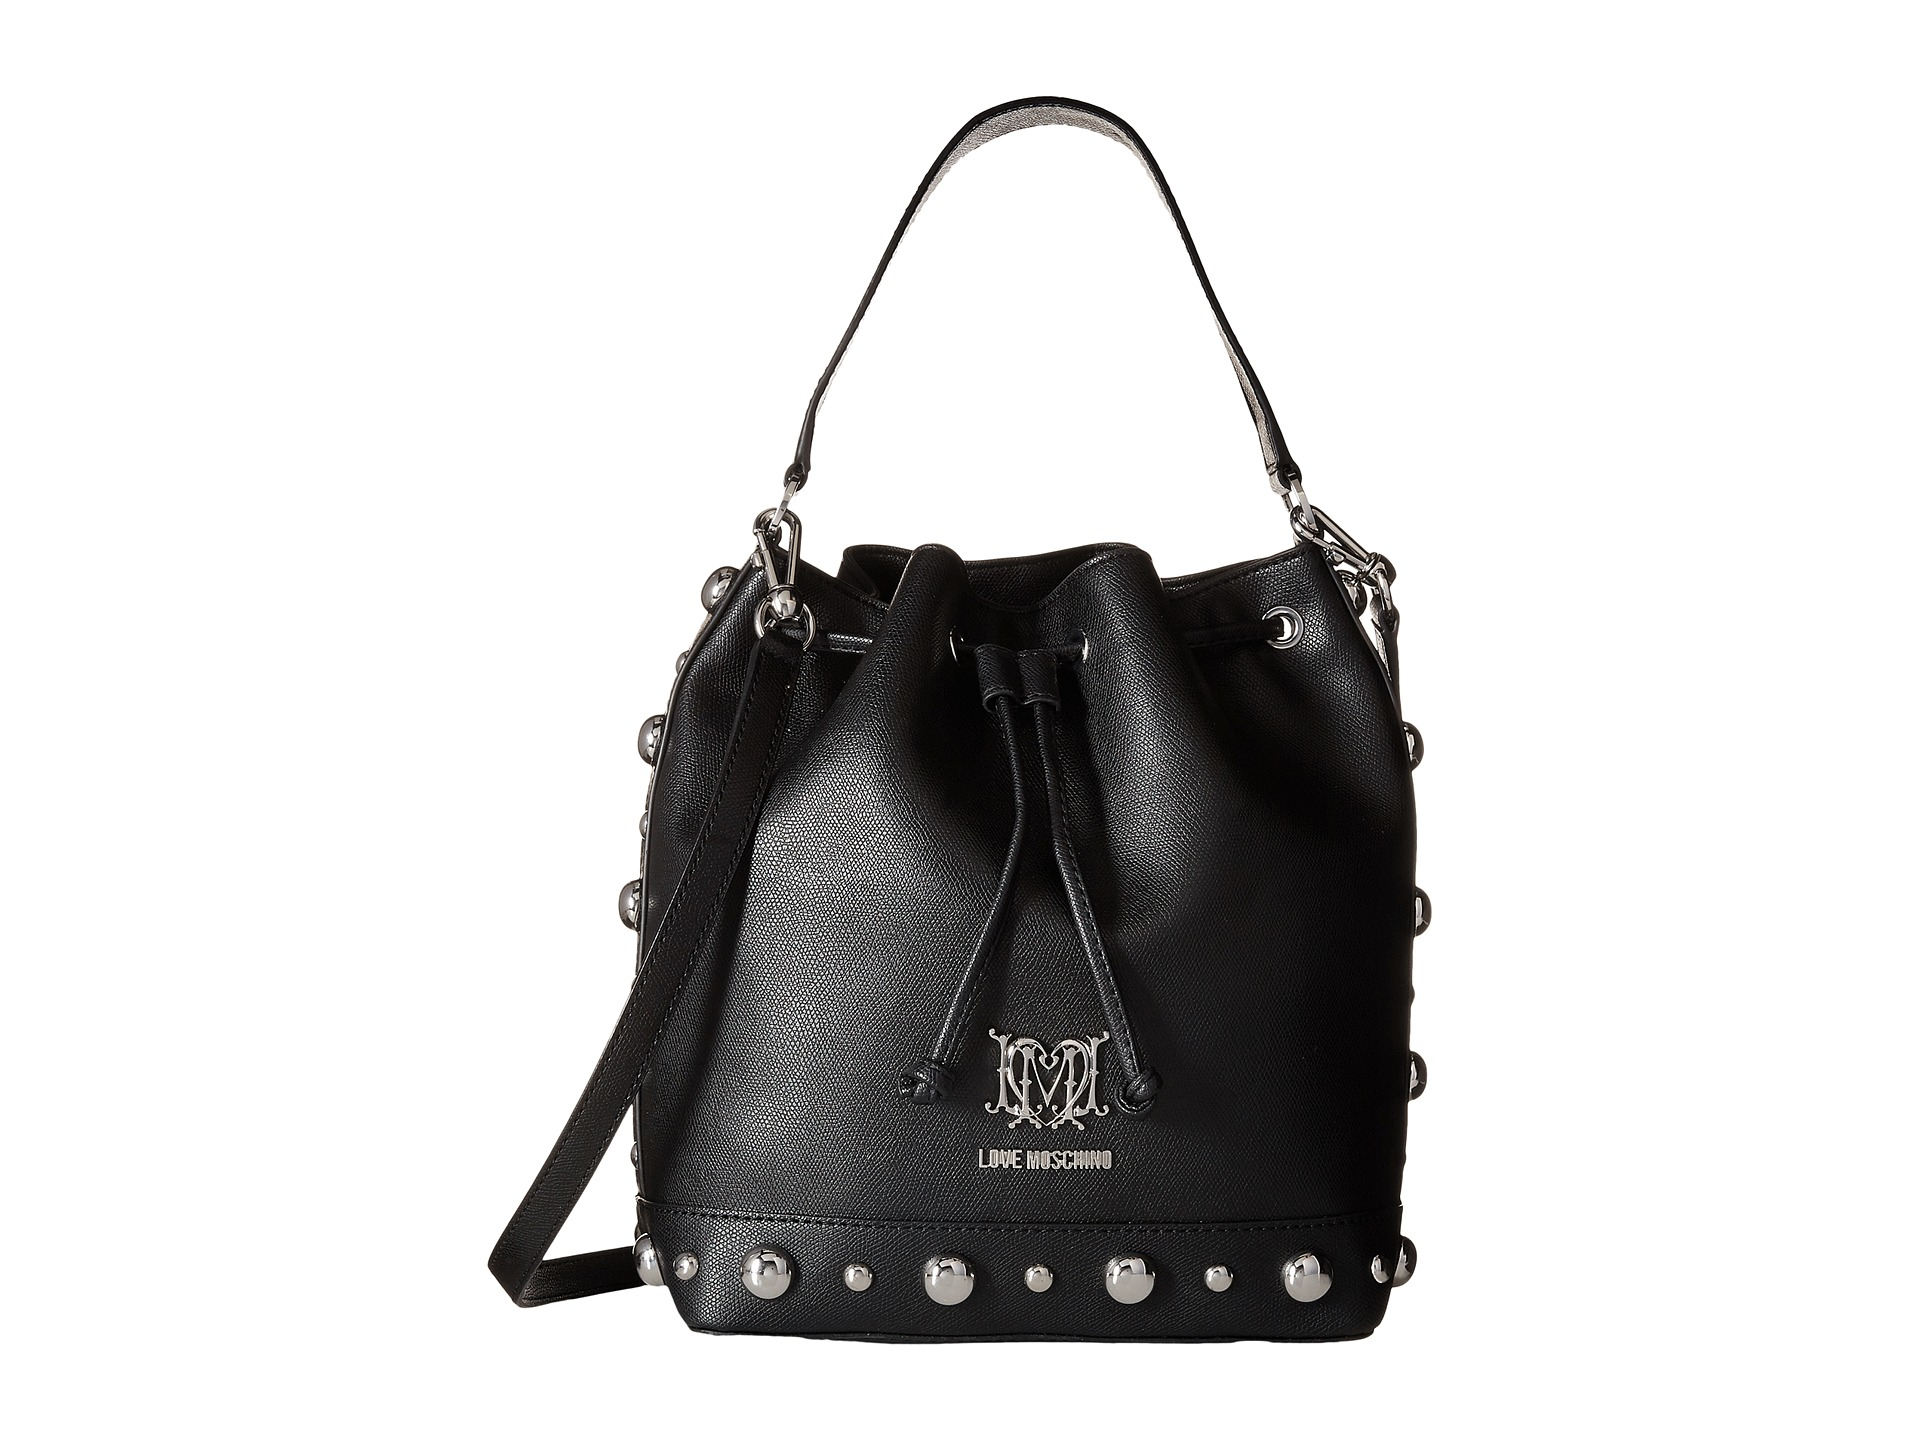 4b176480b Love Moschino Studs Bucket Bag in Black - Lyst